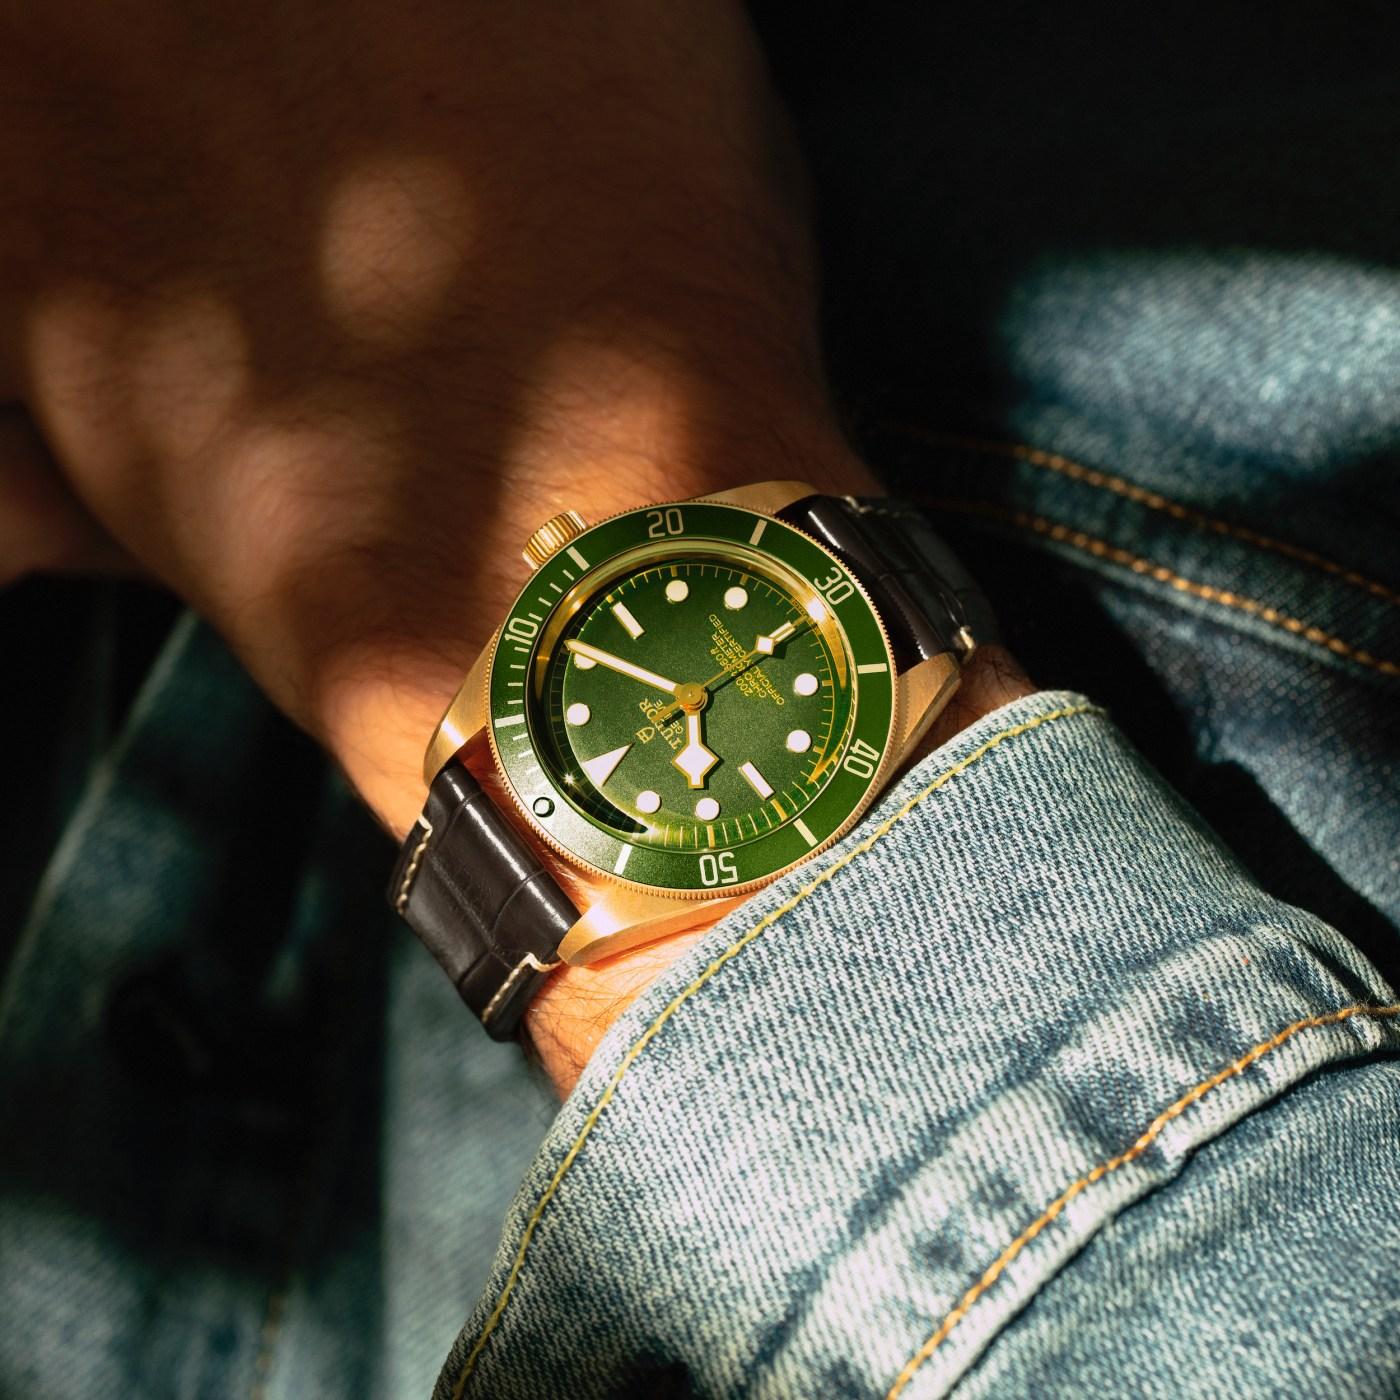 Tudor Black Bay Fifty-Eight 18K wristshot